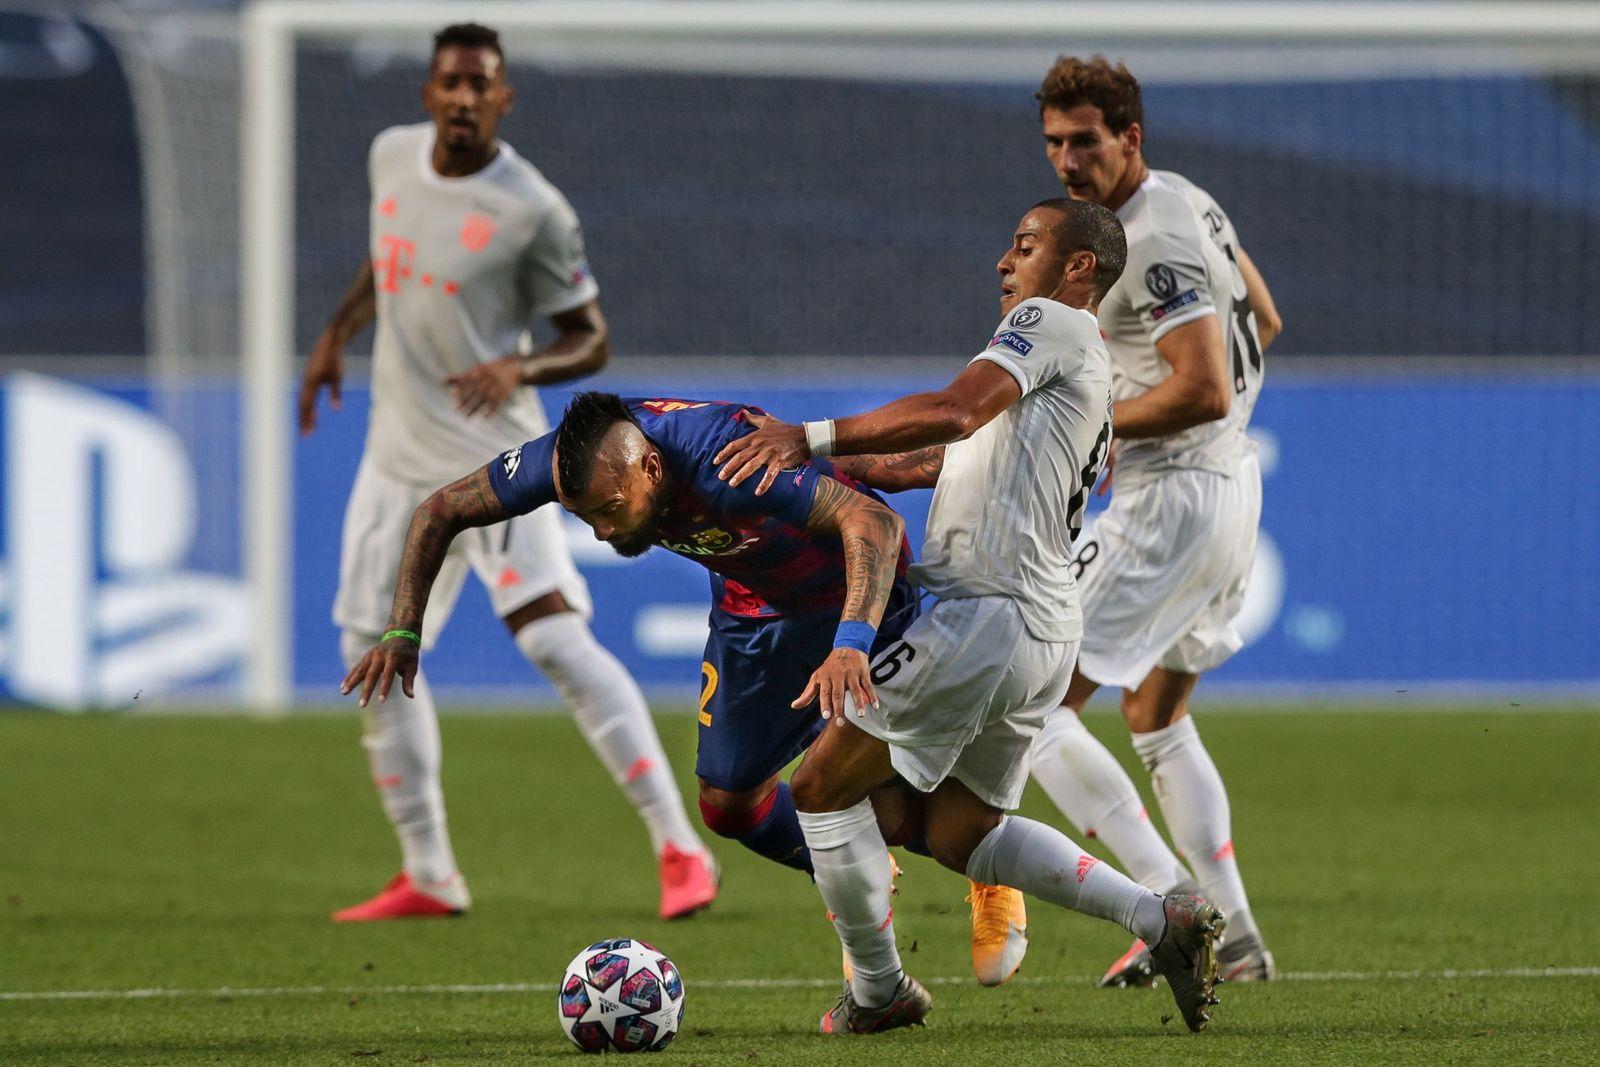 FC Barcelona vs Bayern Munich, Lisbon, Portugal - 14 Aug 2020